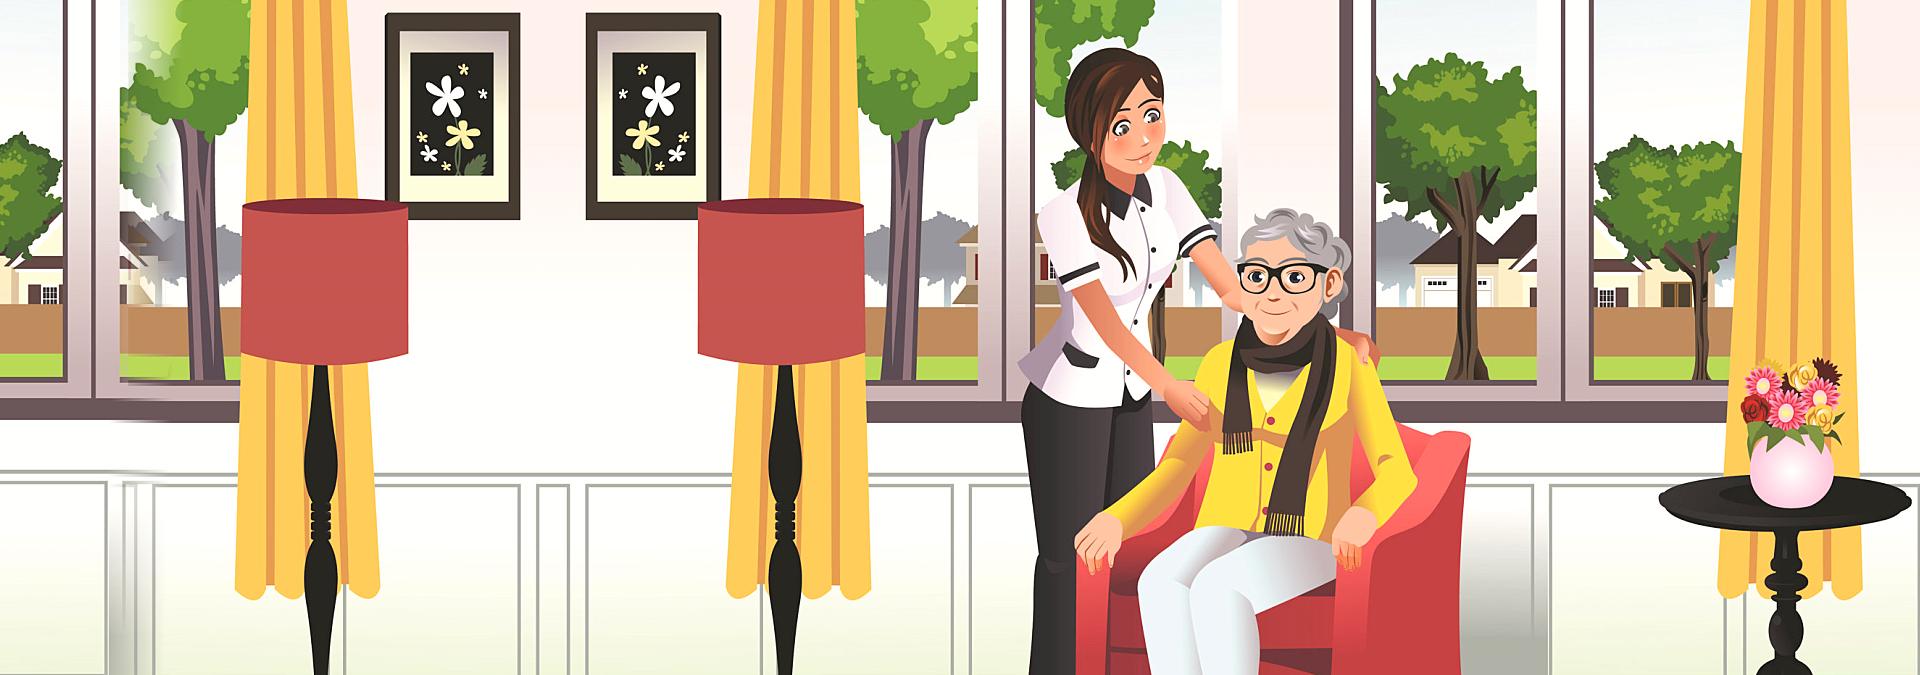 art work of caregiver and a senior